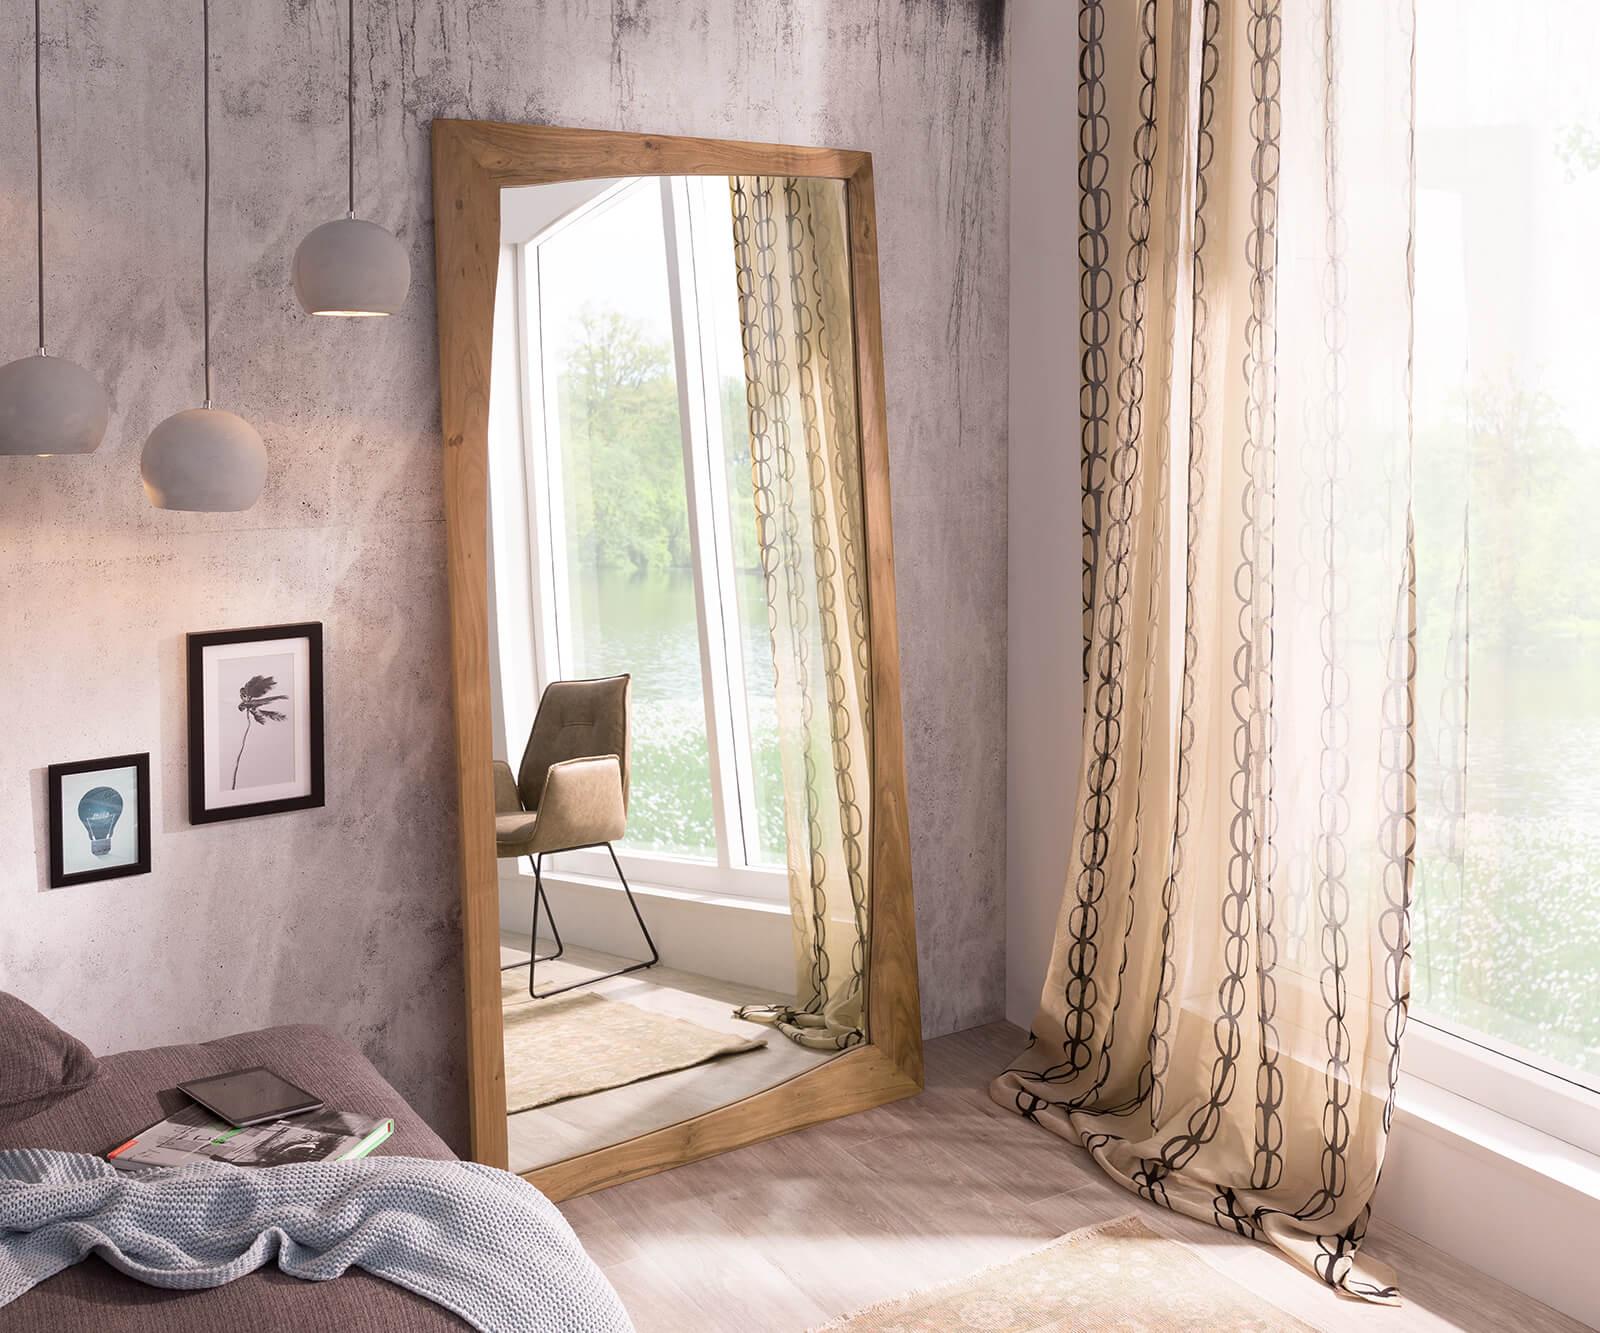 design wandspiegel wyatt 200x100 cm akazie natur m bel. Black Bedroom Furniture Sets. Home Design Ideas